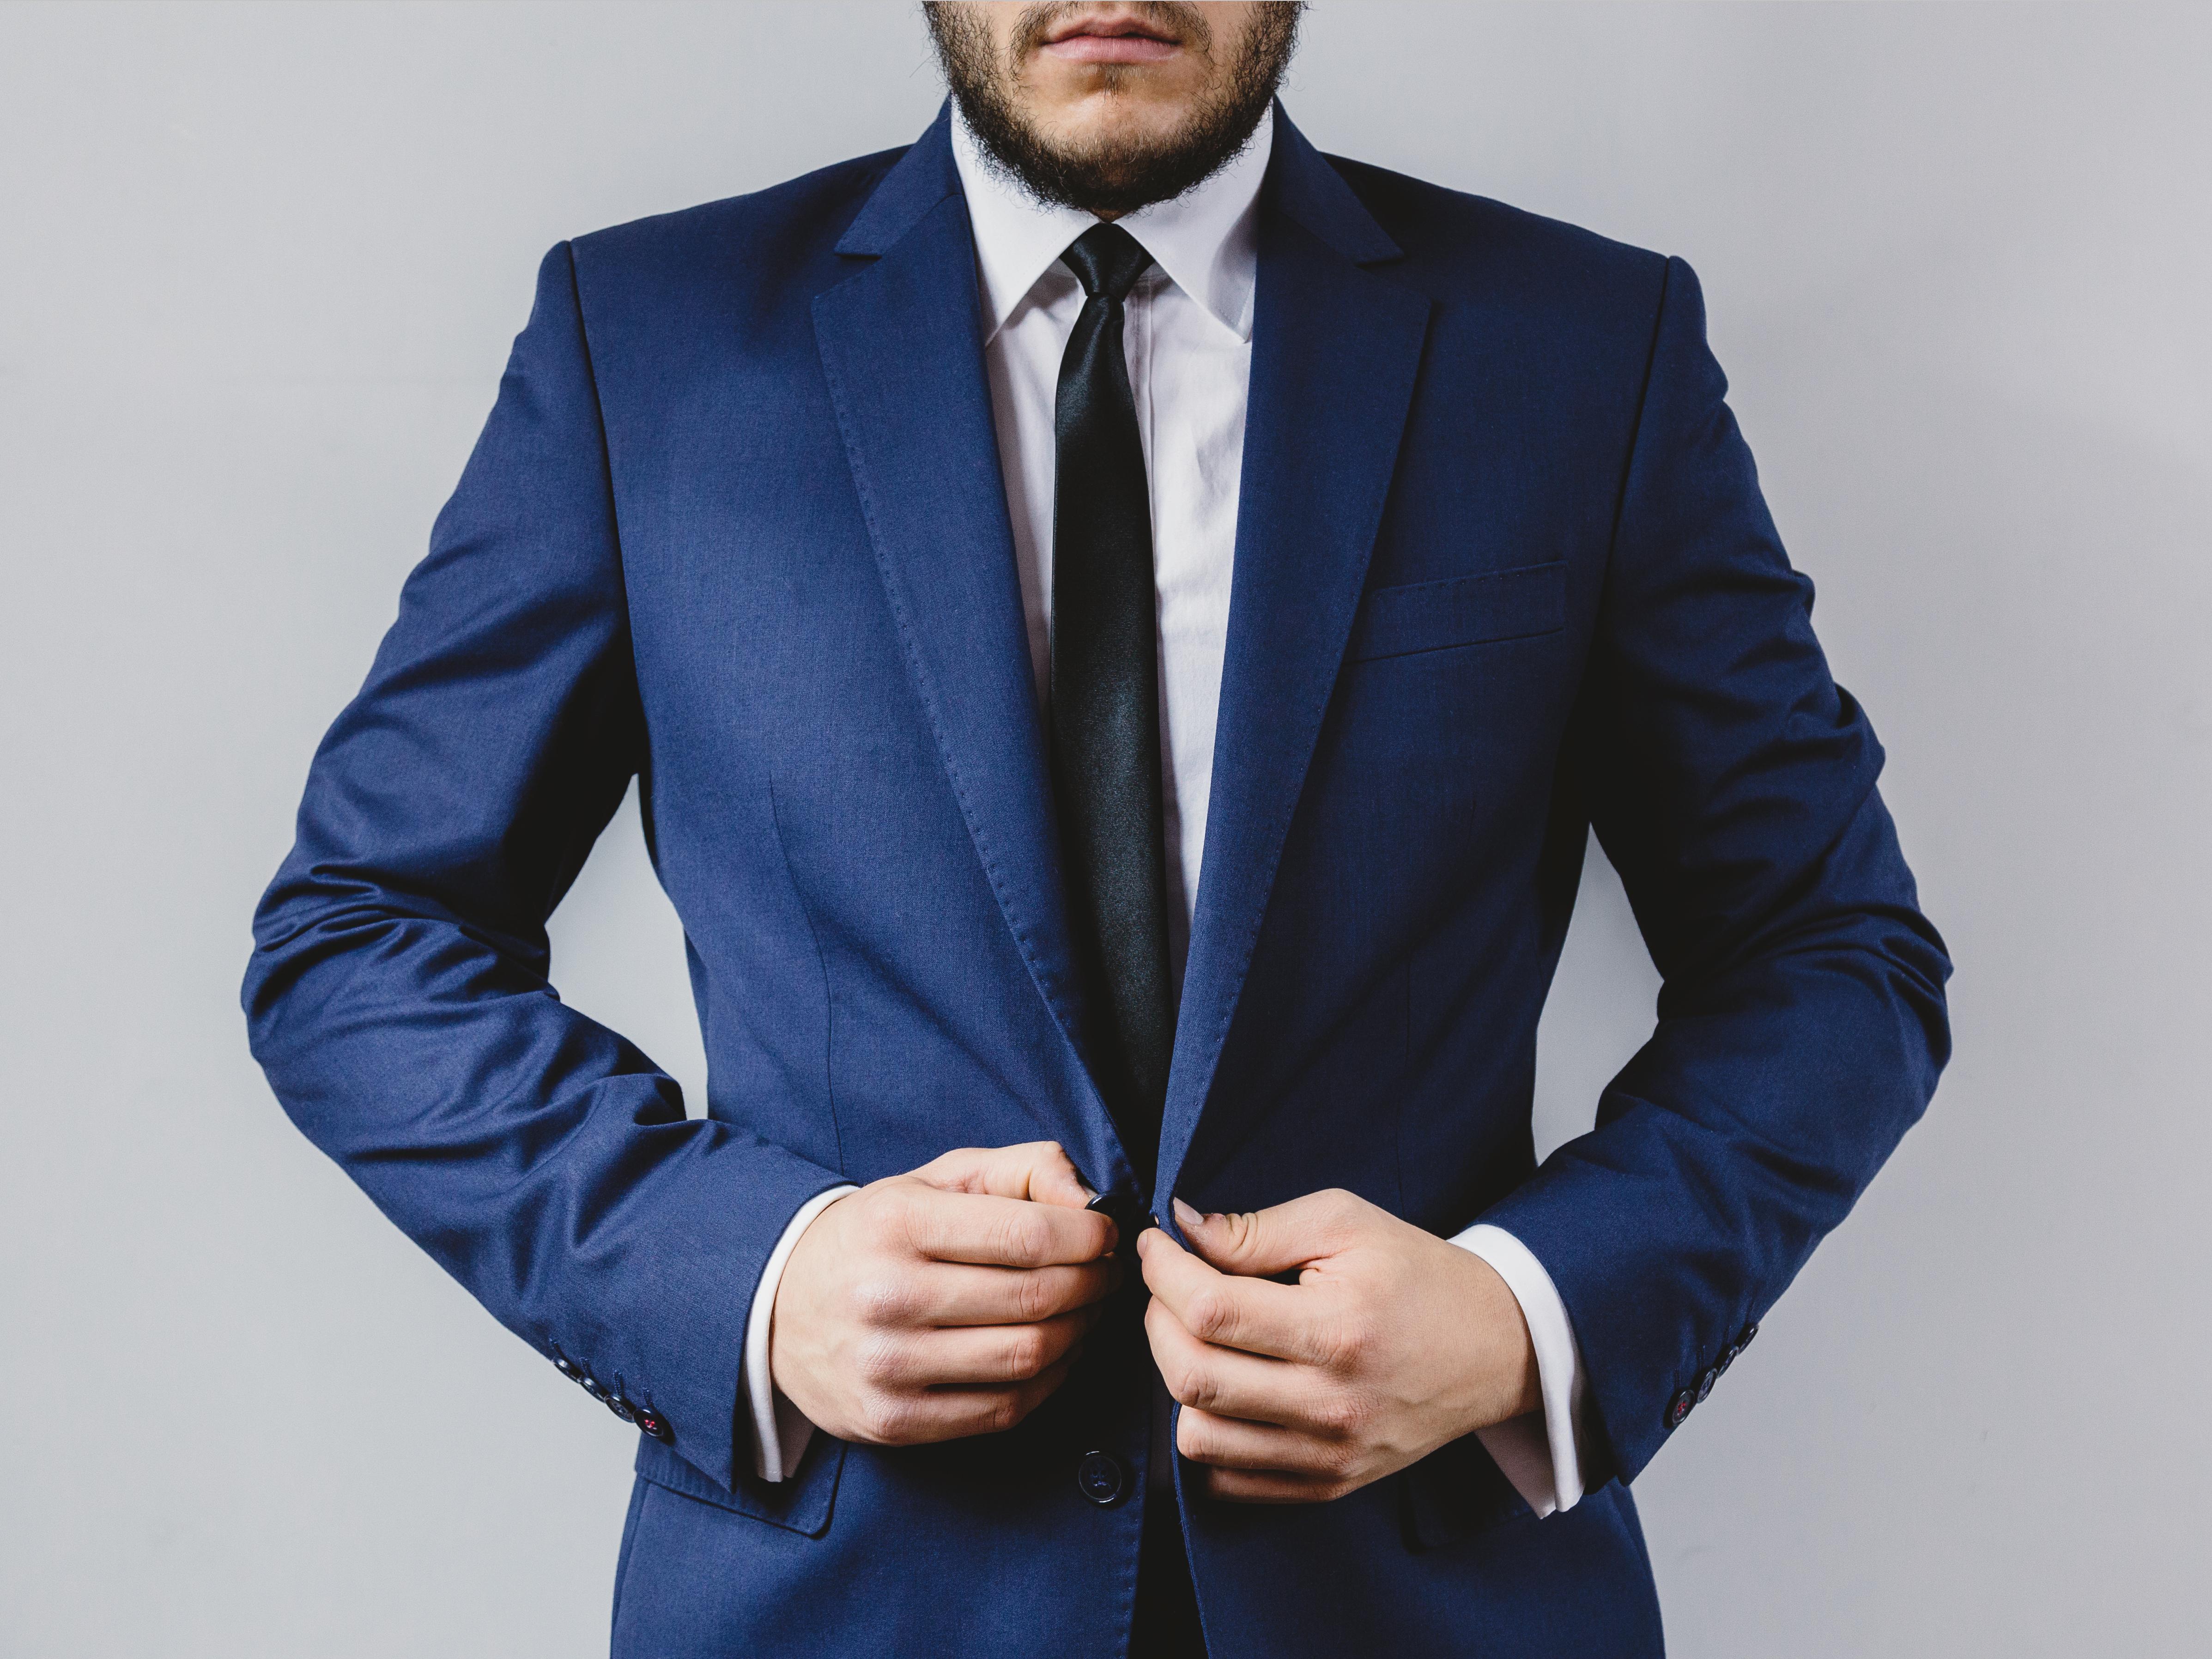 4789x3592 > Suit Wallpapers